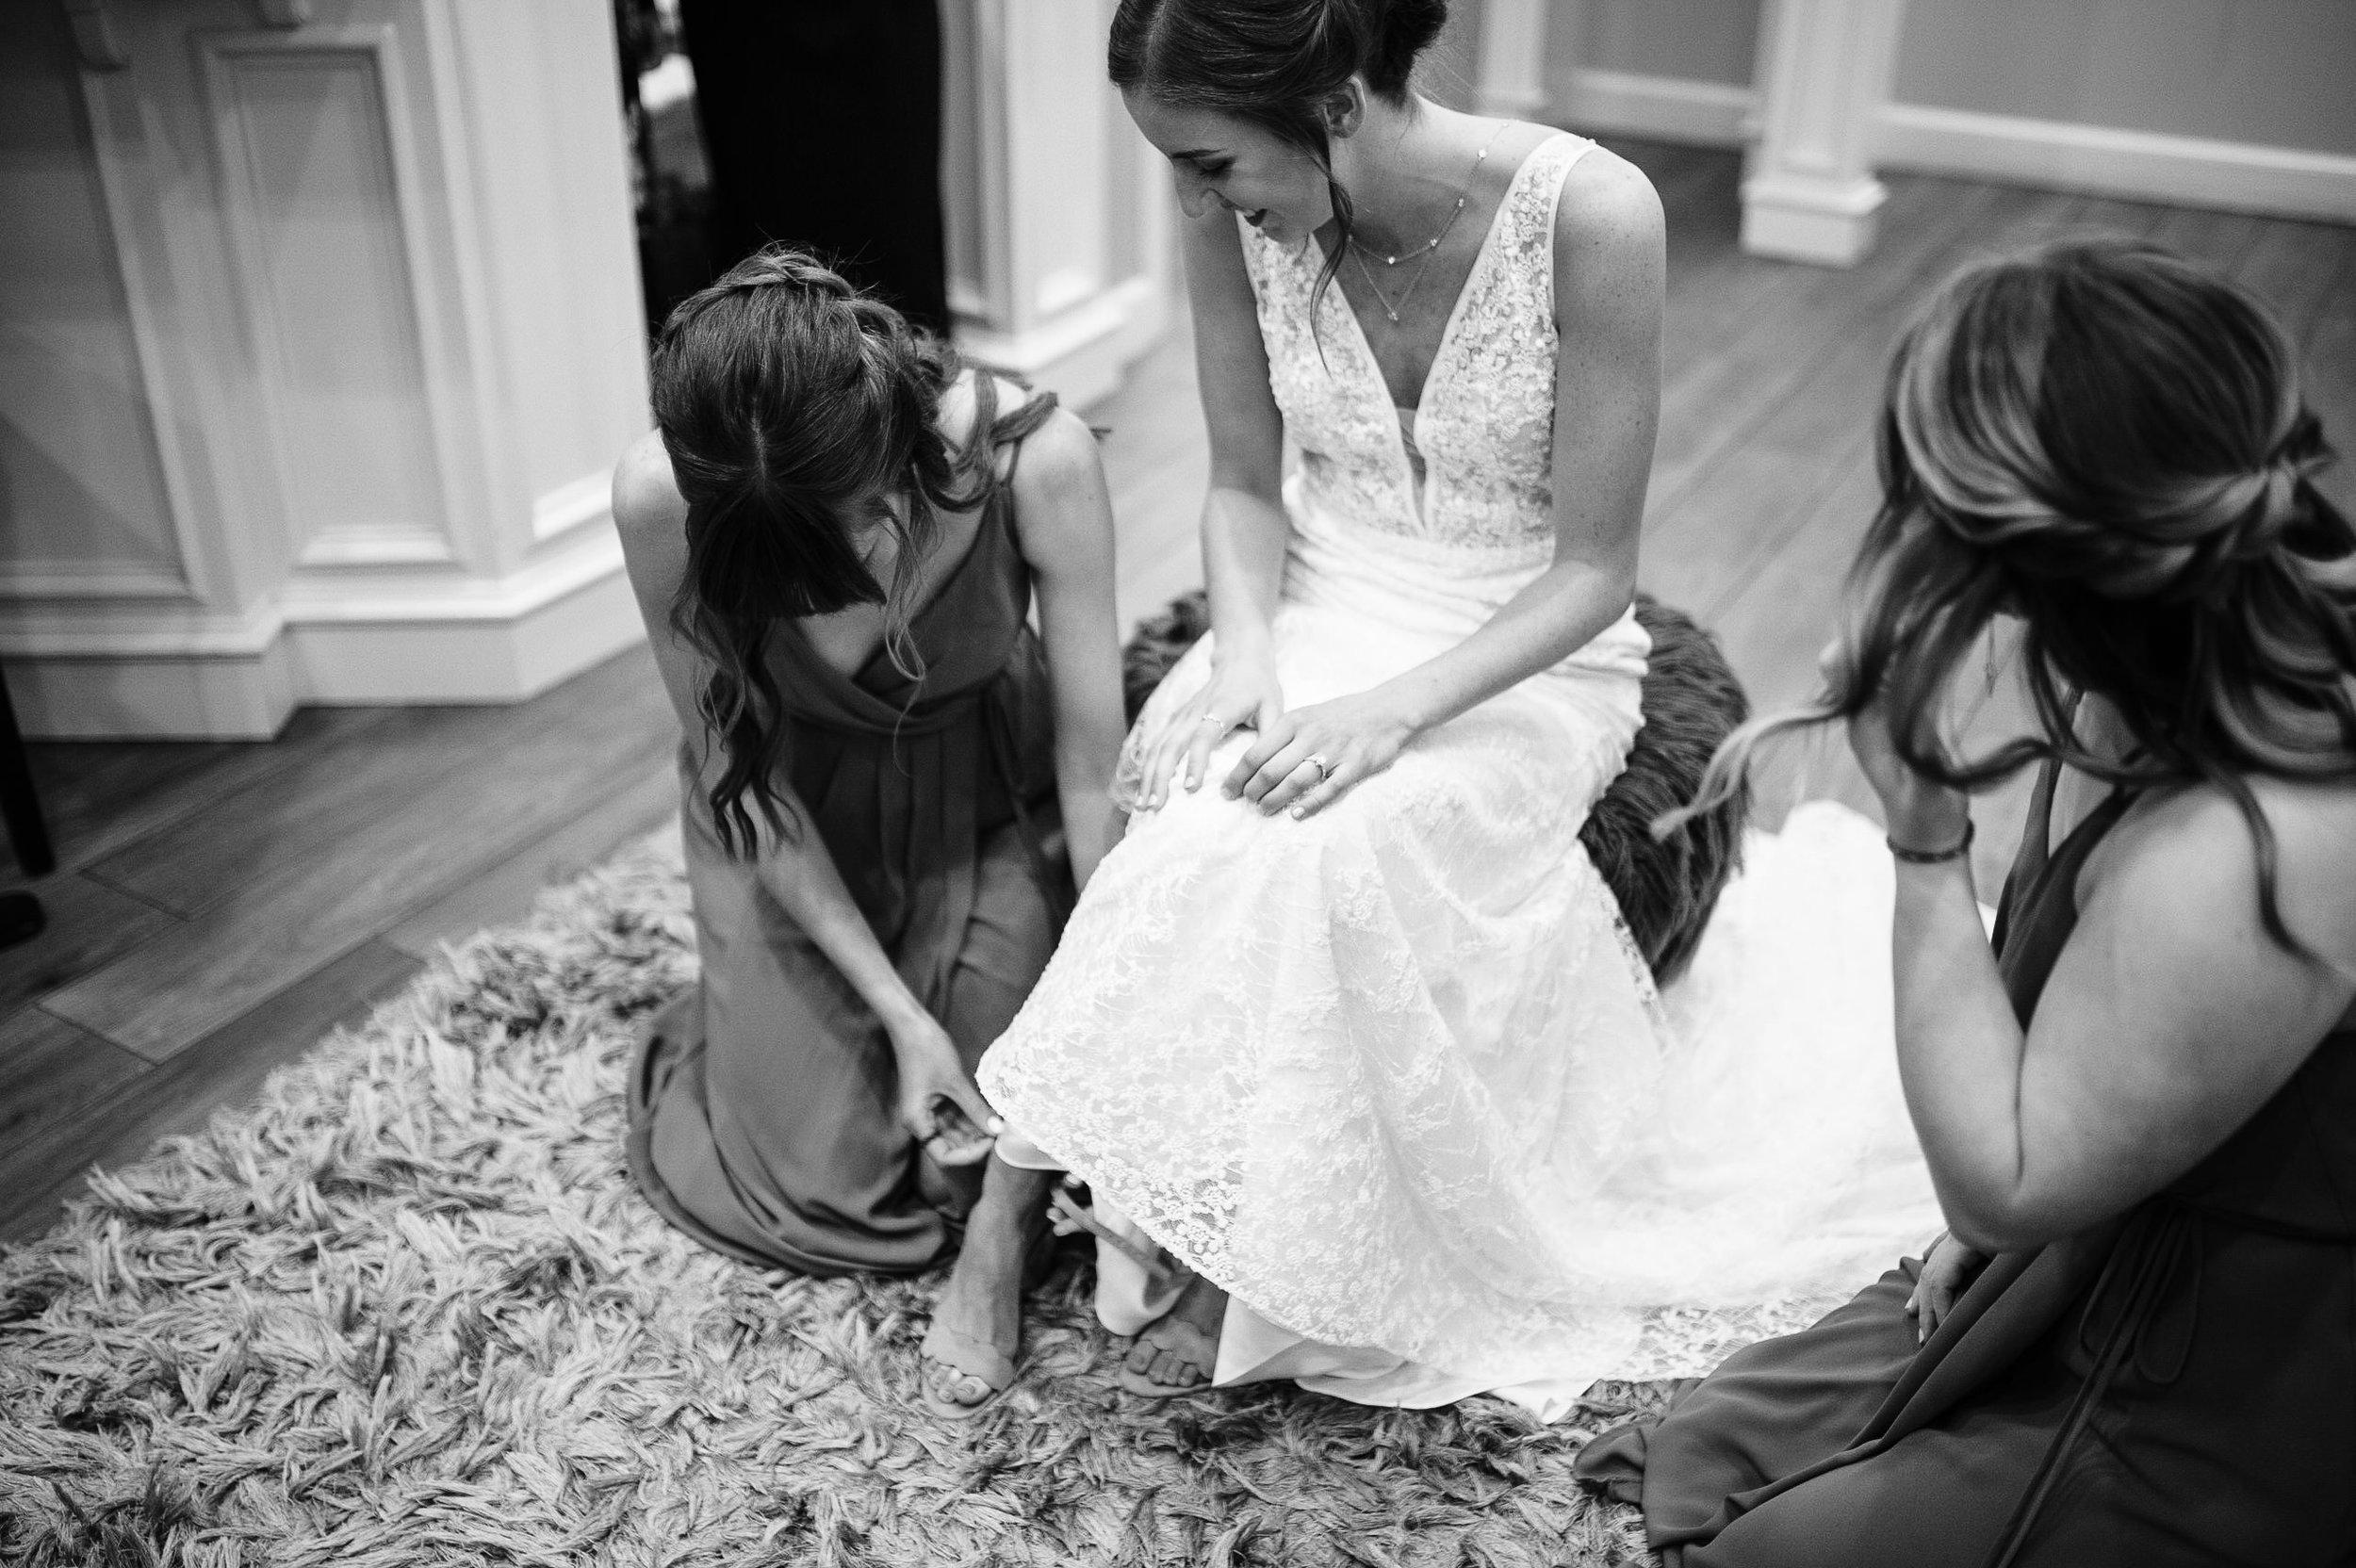 okc-wedding-photographer-coles-garden-wedding-okc-best-wedding-photographers-30.jpg